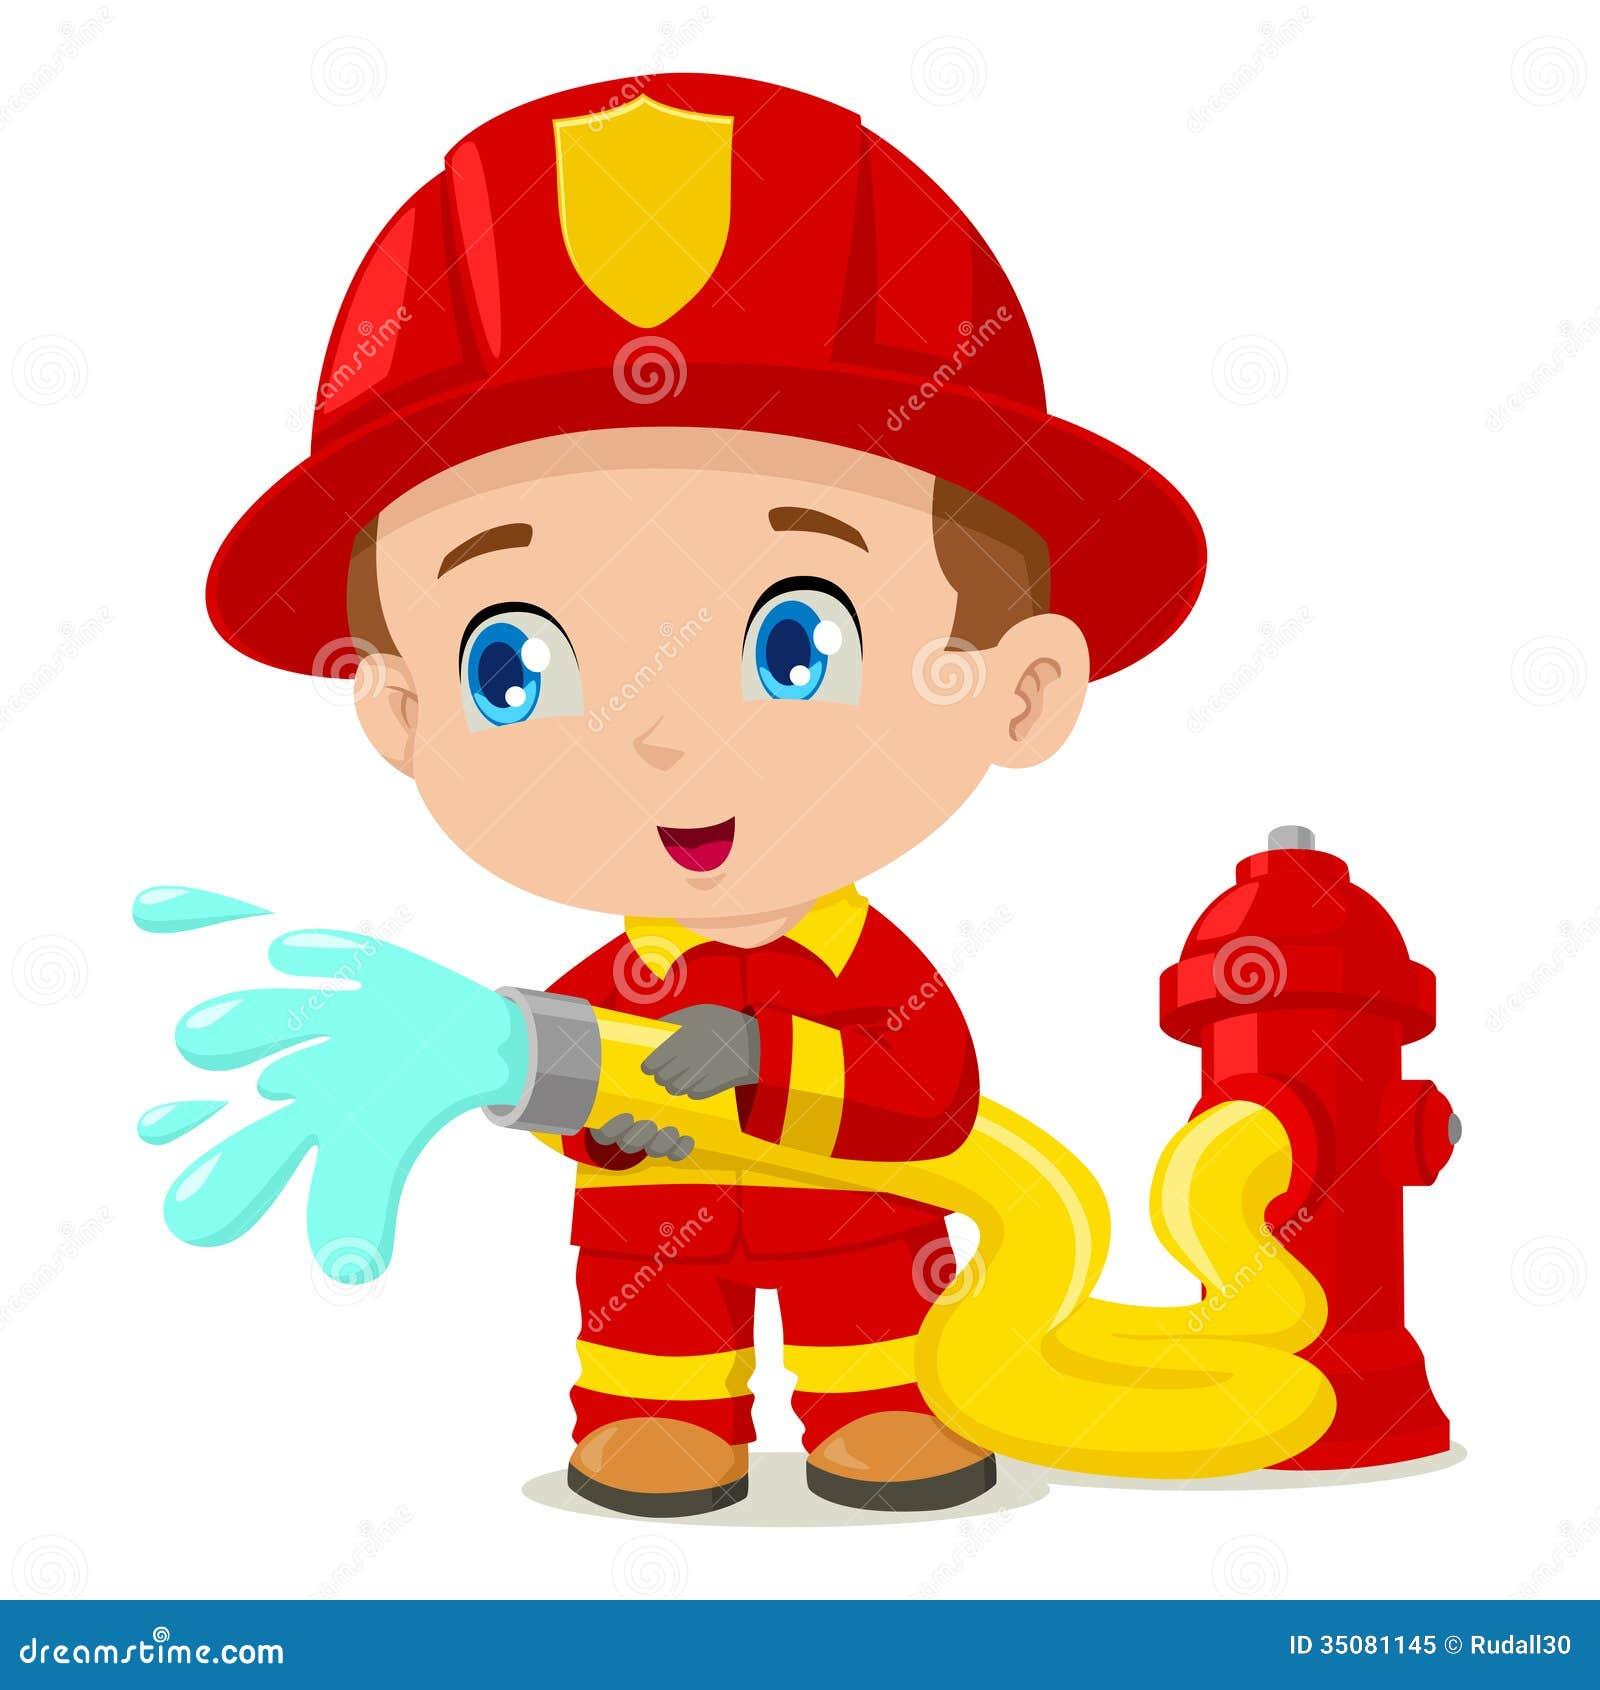 Funny Cartoon Firefighter Firefighter